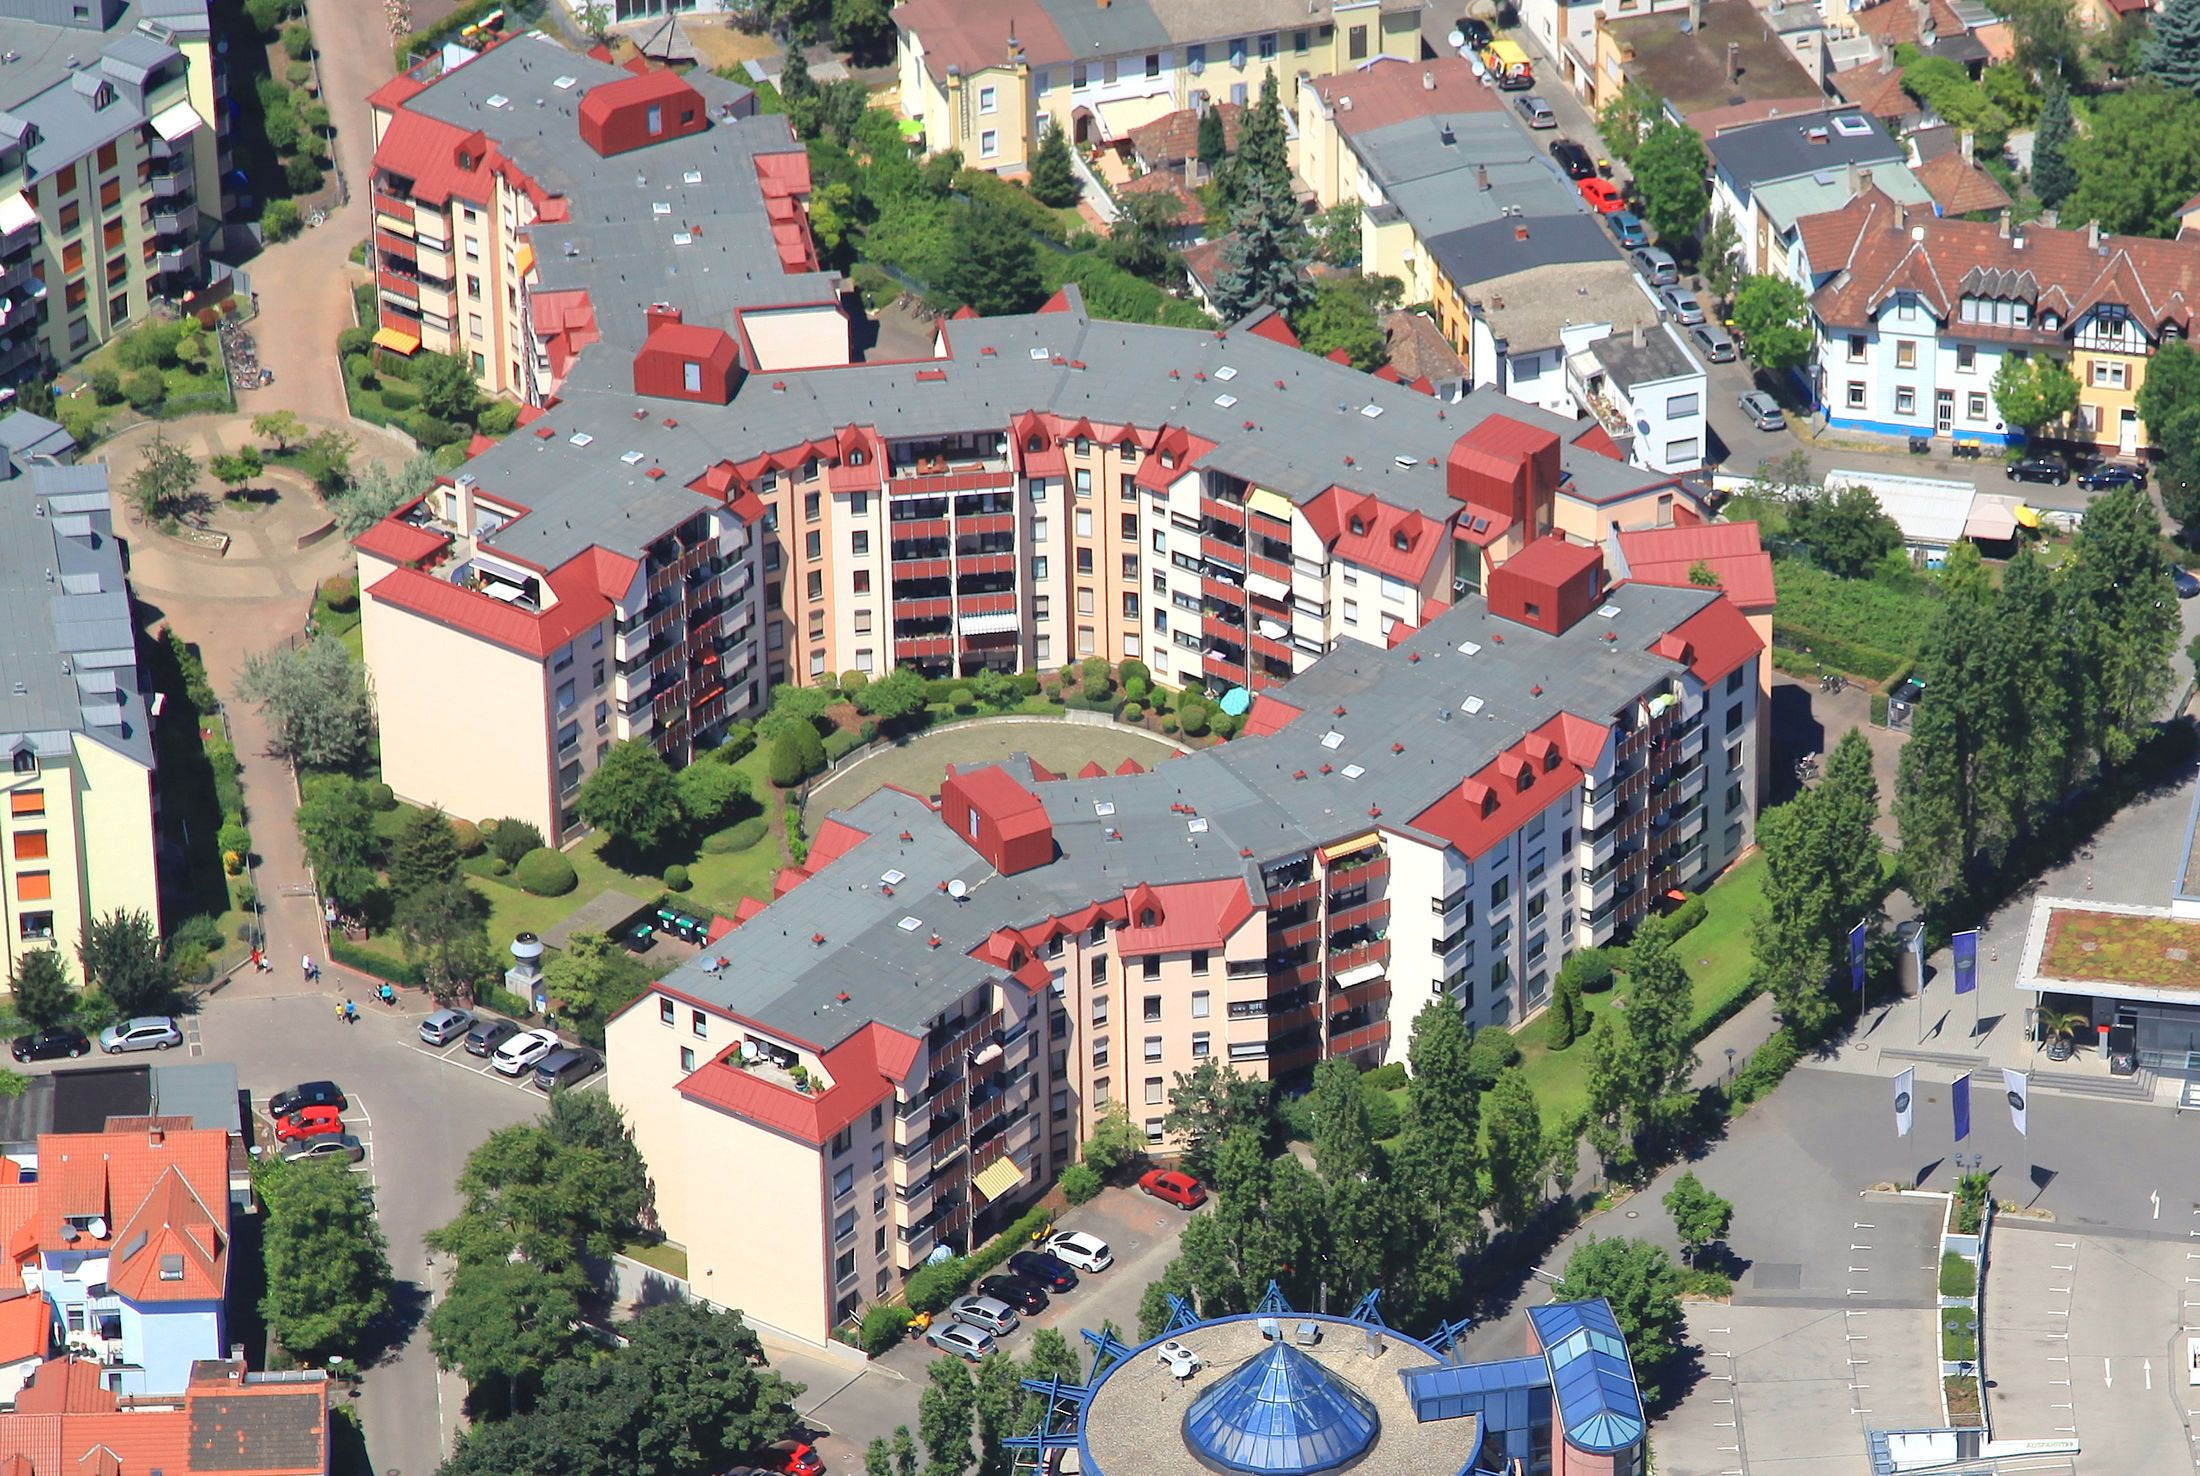 Mina Karcher Platz 2